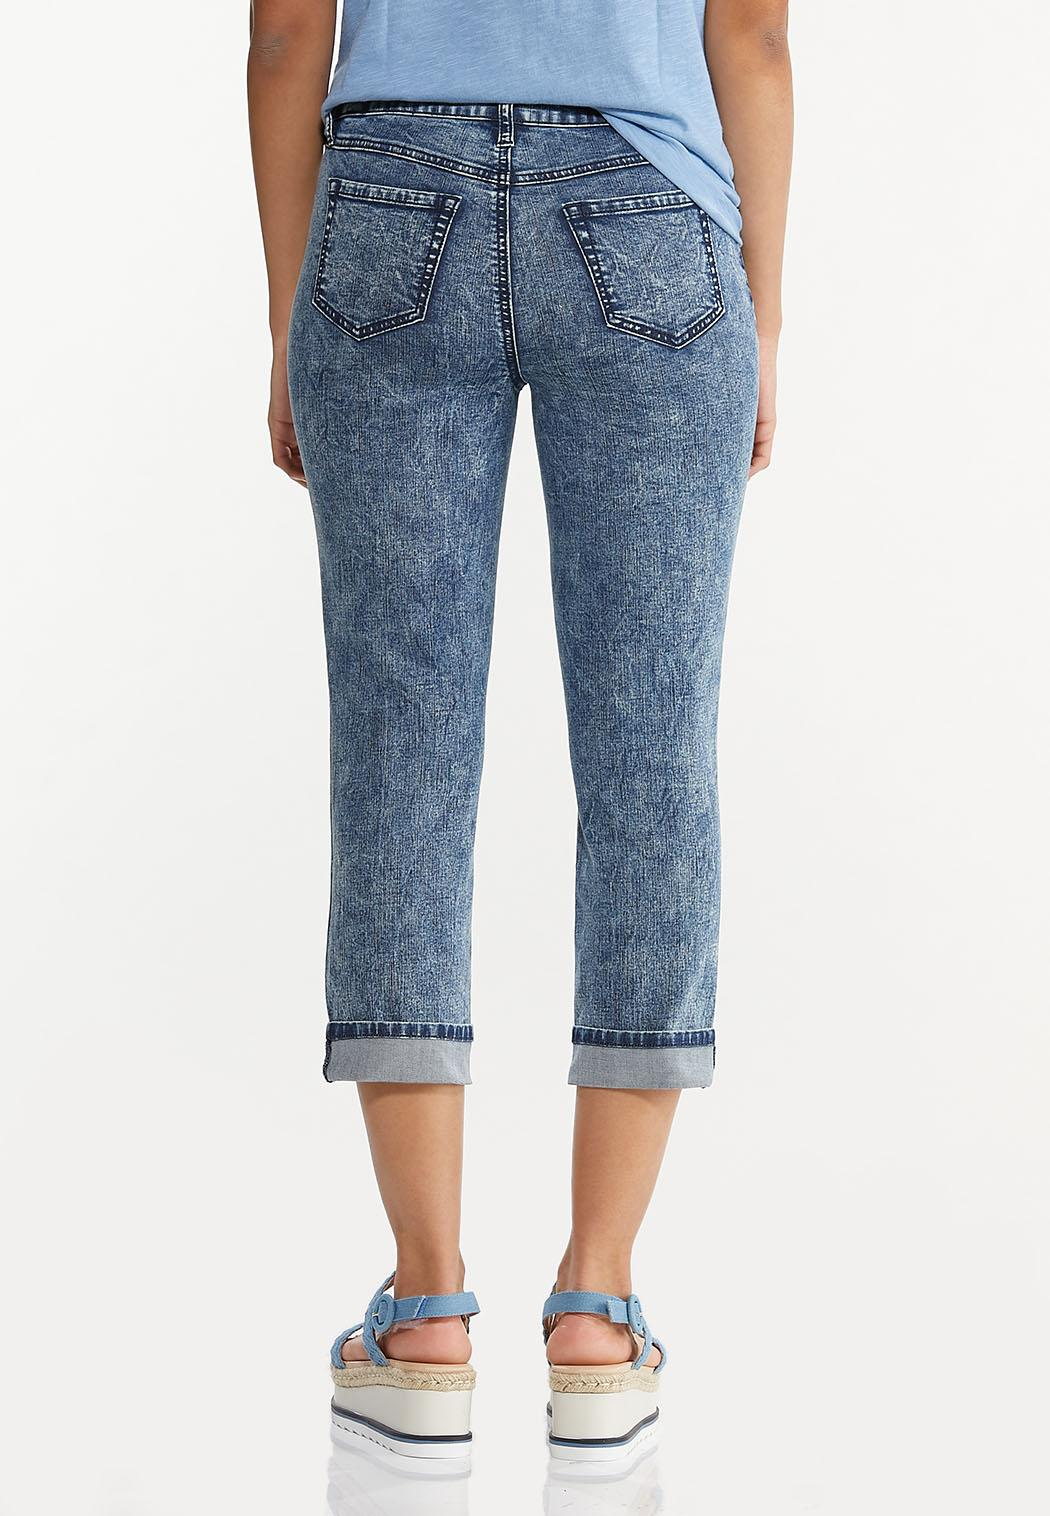 Cropped Vintage Wash Skinny Jeans (Item #44568722)